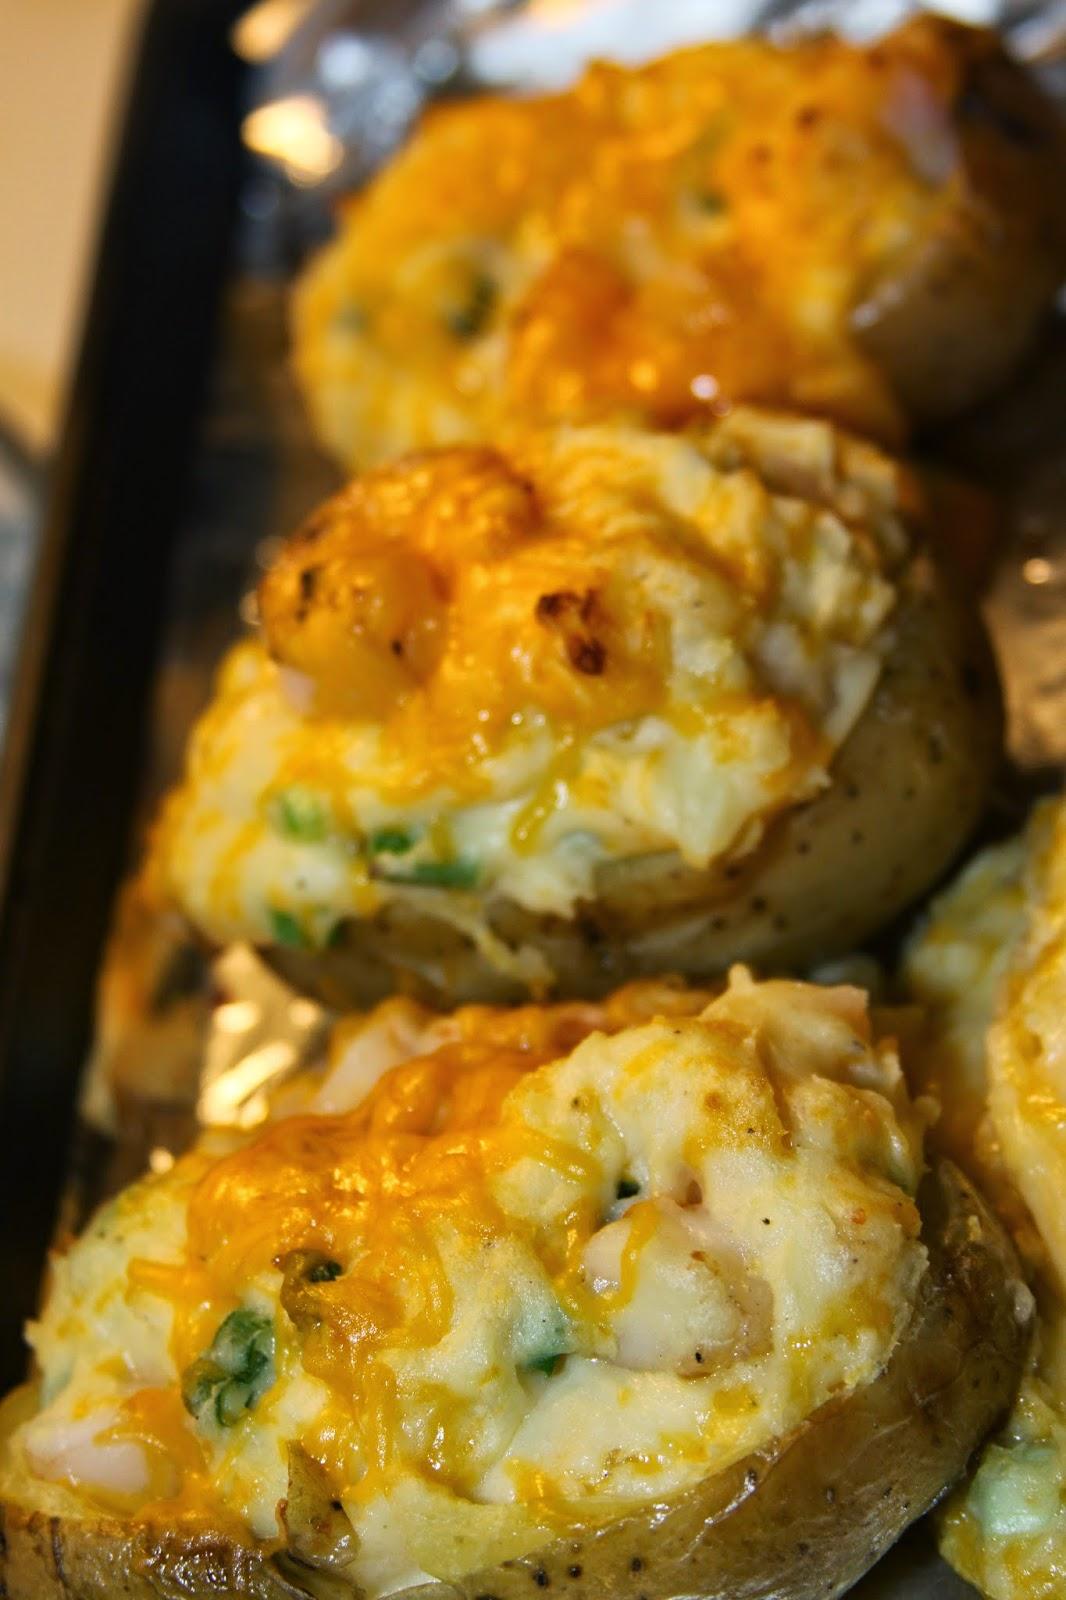 Paula Deen S Twice Baked Shrimp Stuffed Potatoes For The Love Of Food